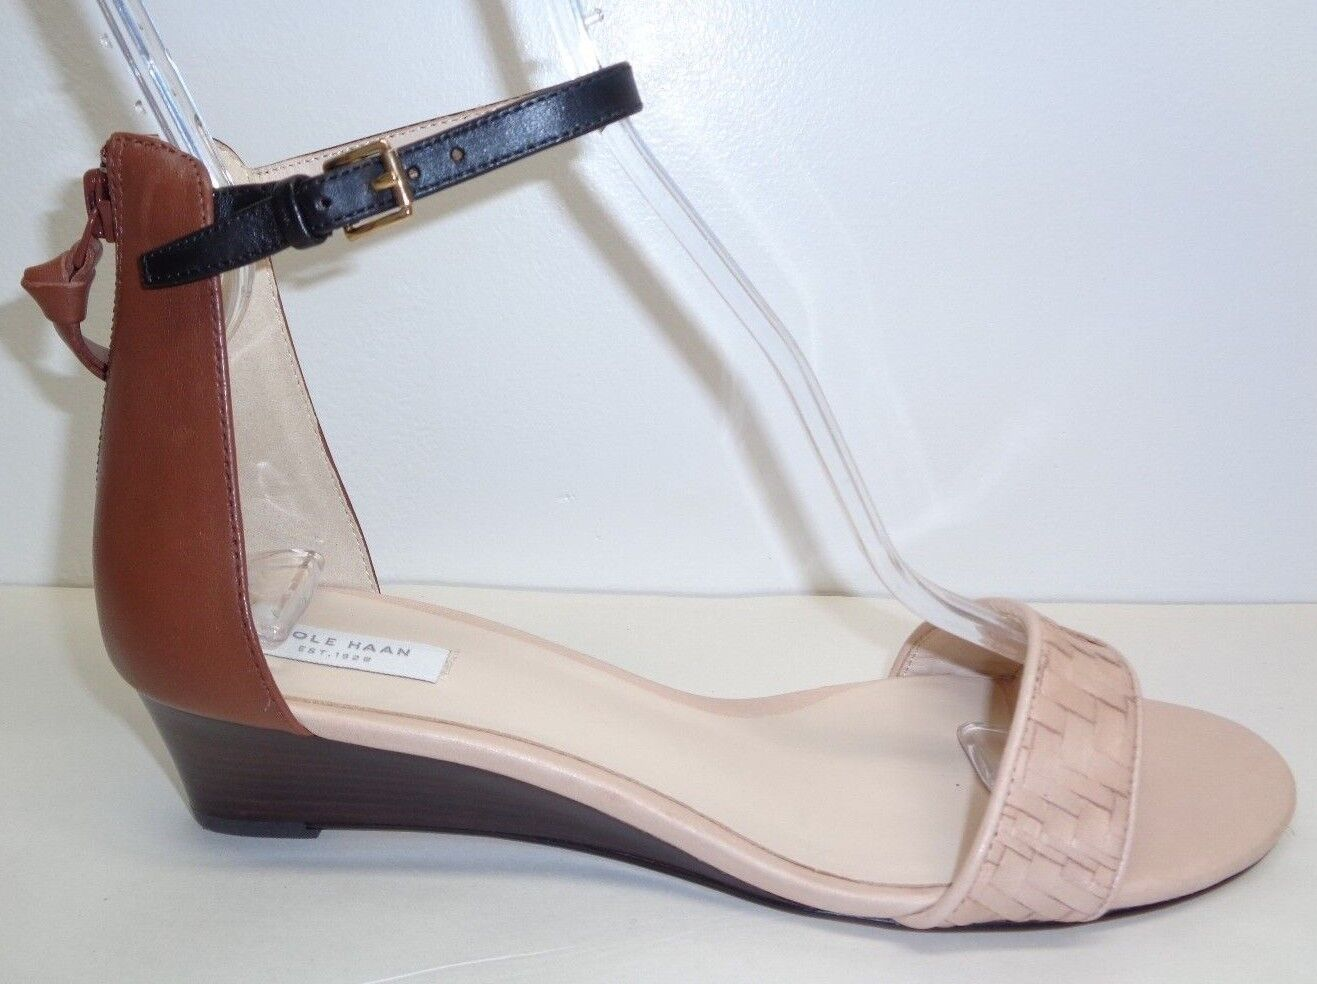 Cole Haan Größe 8.5 M Wedge GENEVIEVE WEAVE Tan Leder Wedge M Sandales New Damenschuhe Schuhes 6f2878